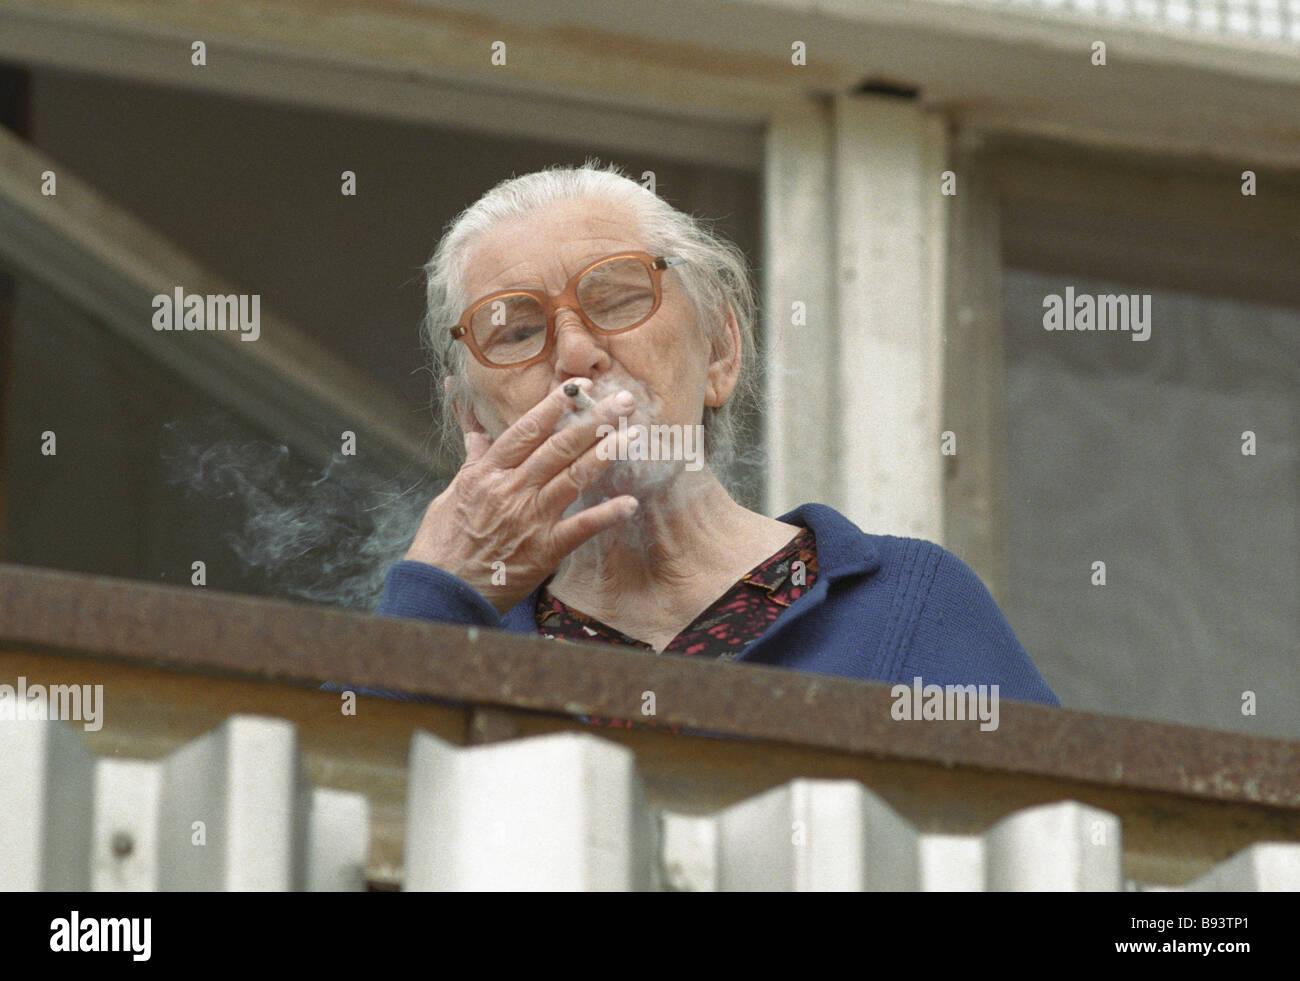 smoking balcony stockfotos smoking balcony bilder alamy. Black Bedroom Furniture Sets. Home Design Ideas